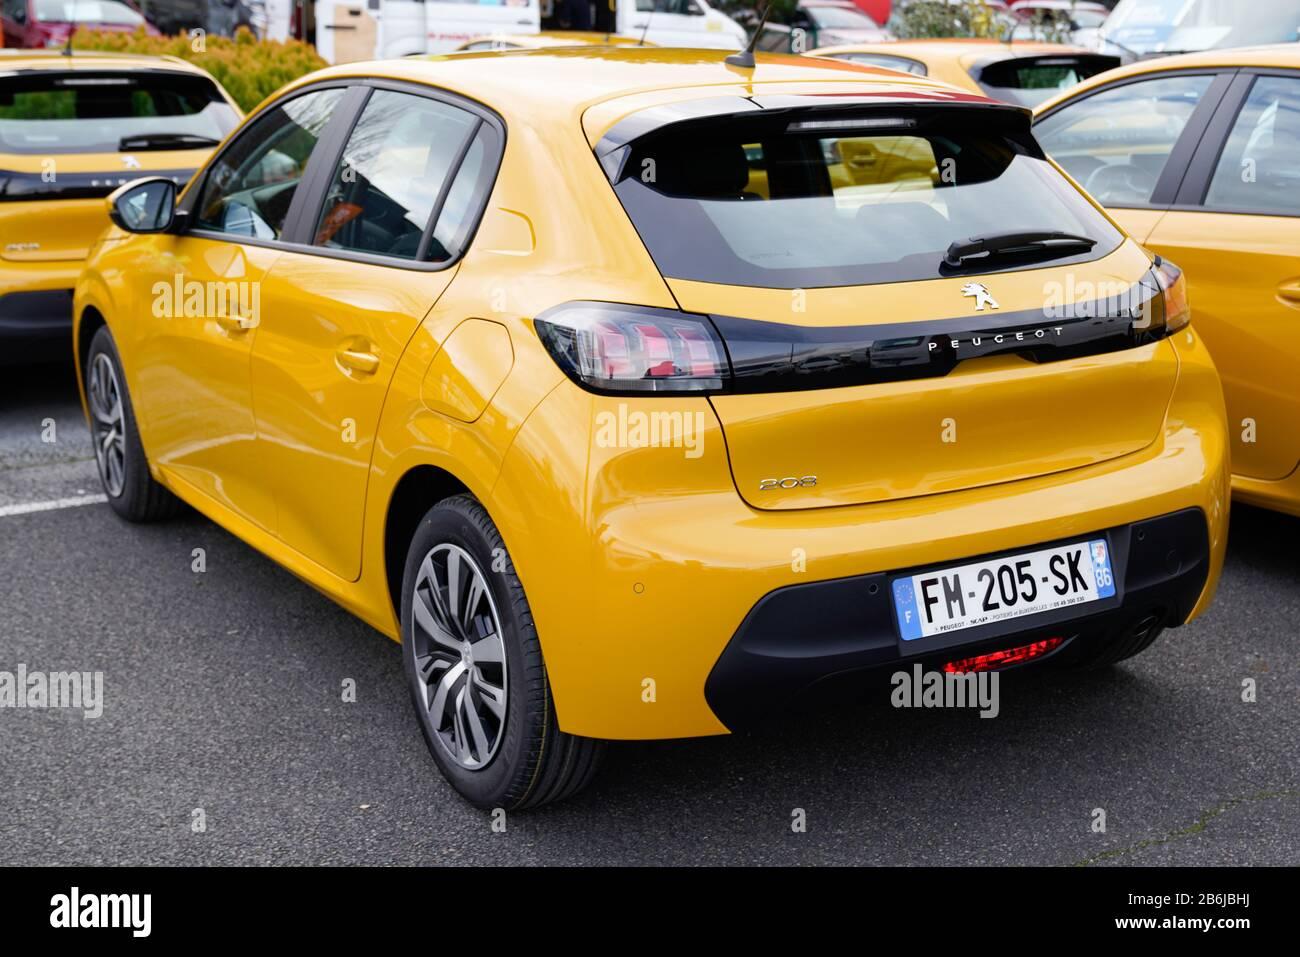 Bordeaux Aquitaine France 02 01 2020 Peugeot 208 Gt Line Rear View New Modern Vehicle Stock Photo Alamy